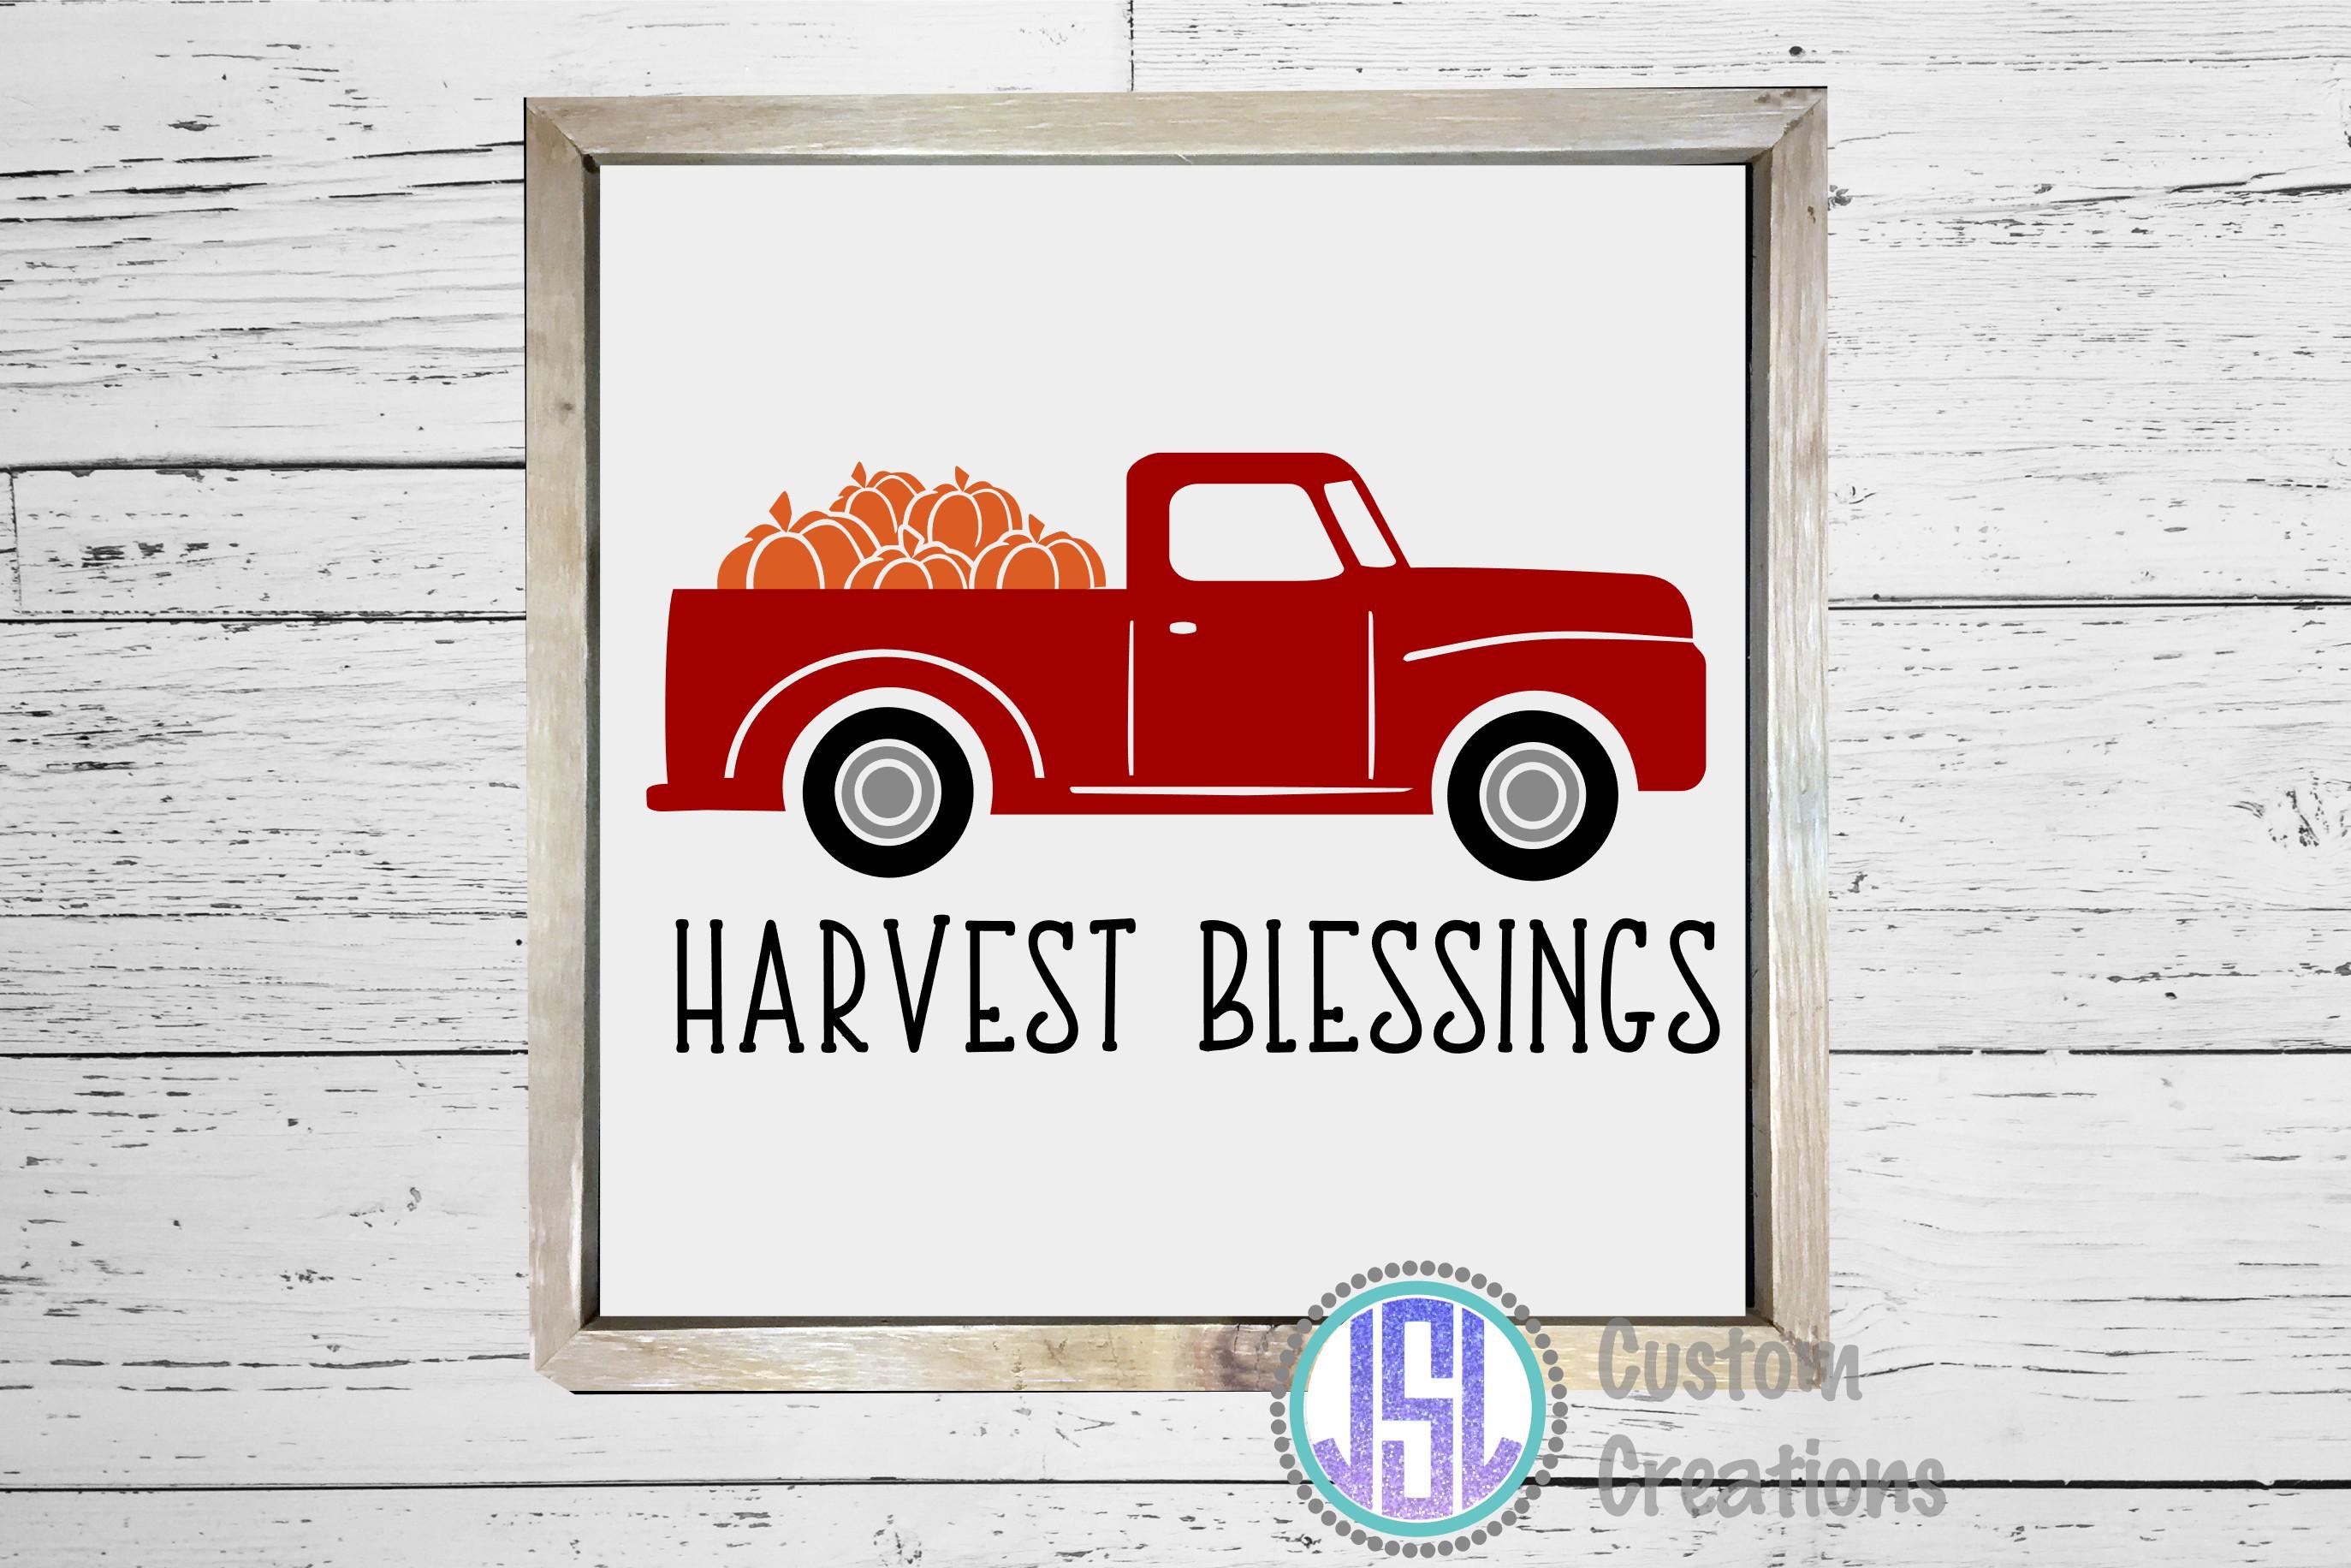 Harvest Blessing Vintage Red Truck  SVG DXF EPS PNG Cut File example image 2